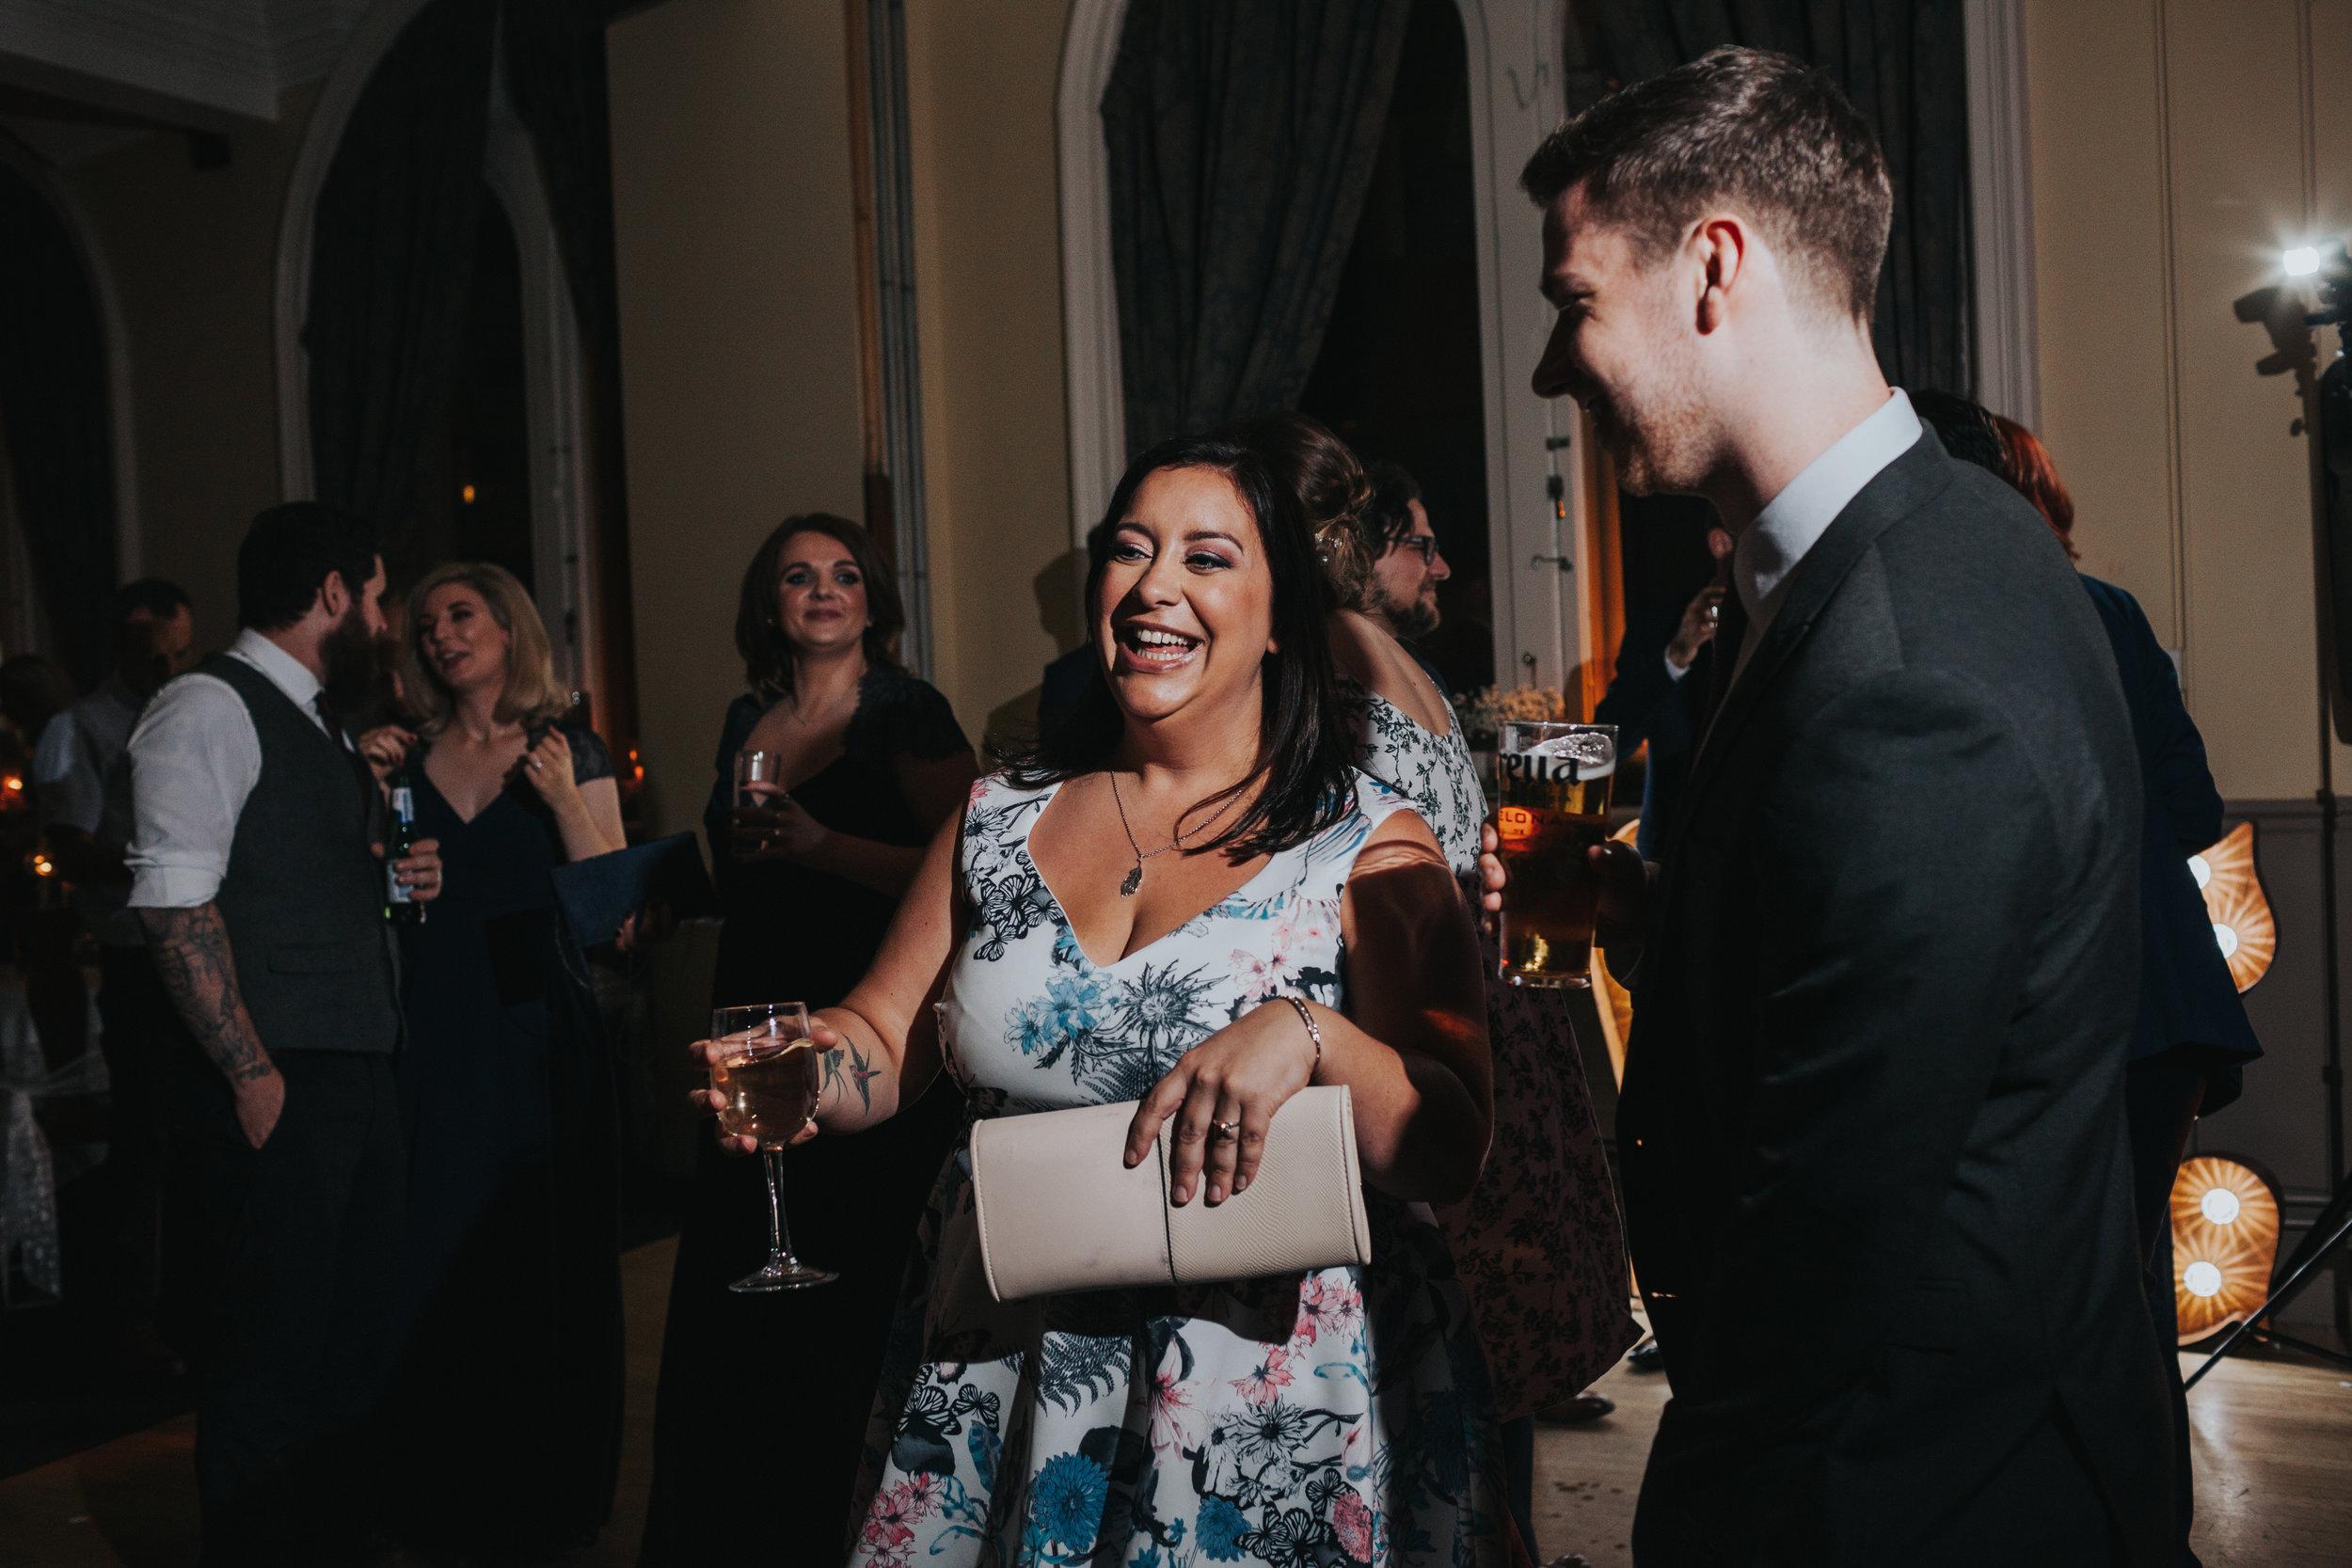 Wedding guests laugh together on dance floor.